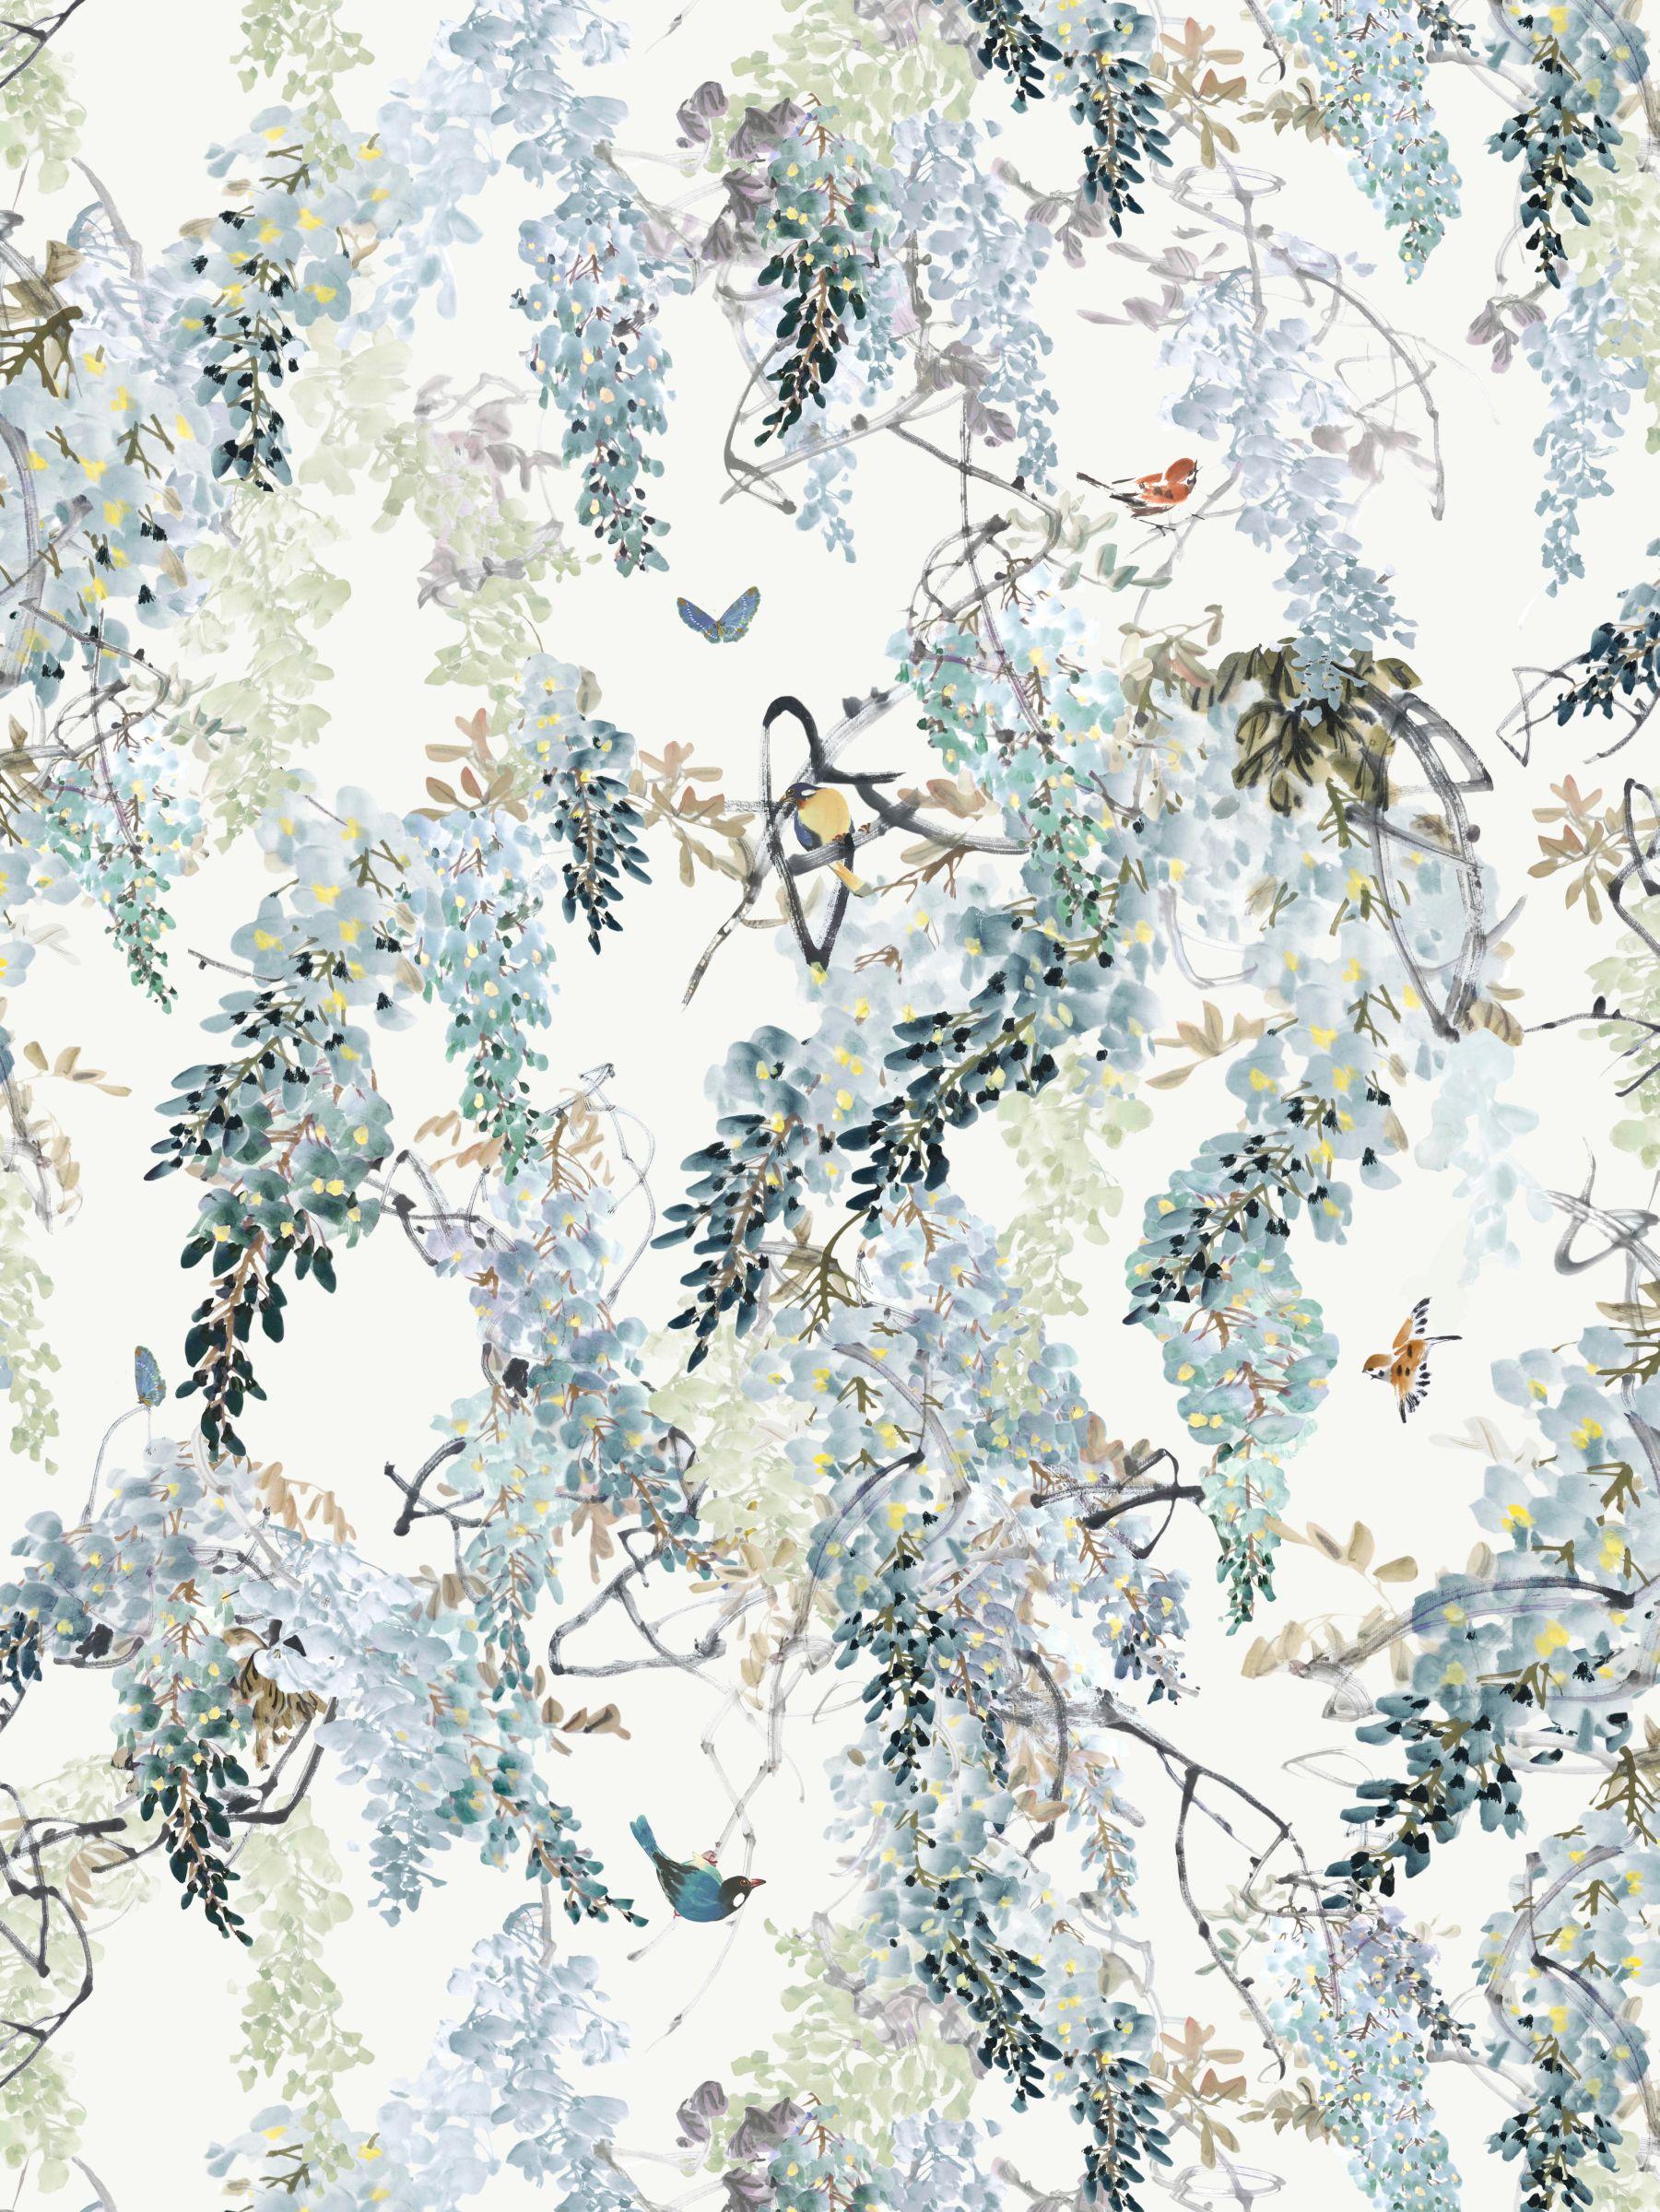 Sanderson Sanderson Waterperry Wisteria Falls Wallpaper Aqua 216298, Panel A